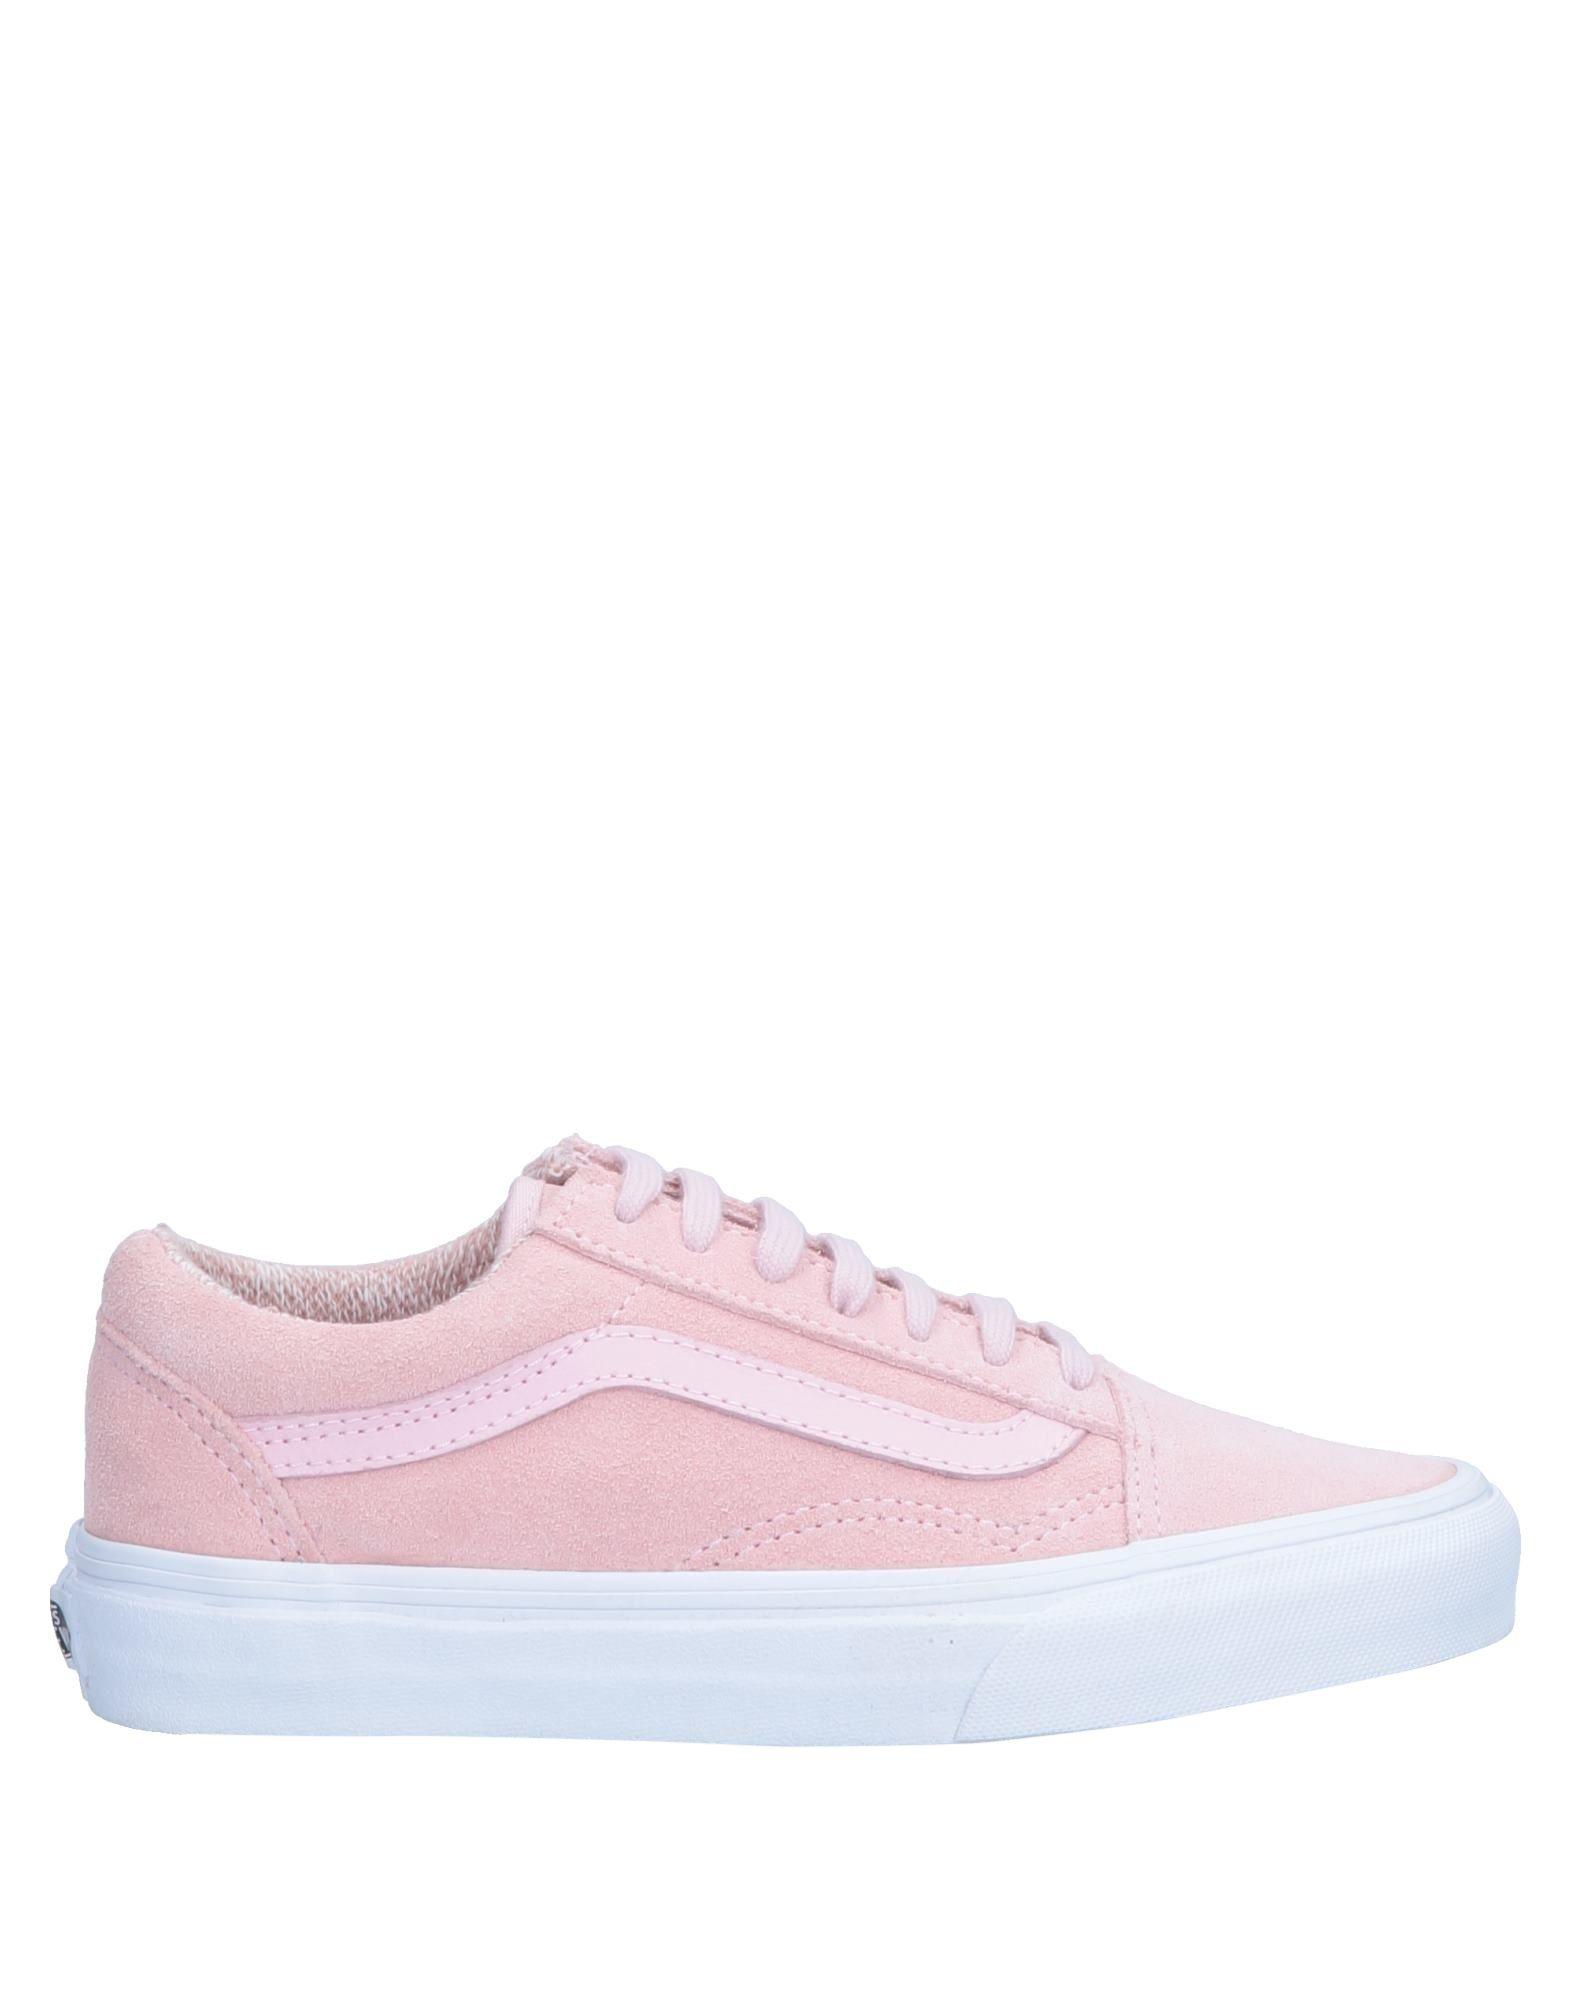 Vans Sneakers Sneakers - Women Vans Sneakers Vans online on  United Kingdom - 11554836GN c2d409